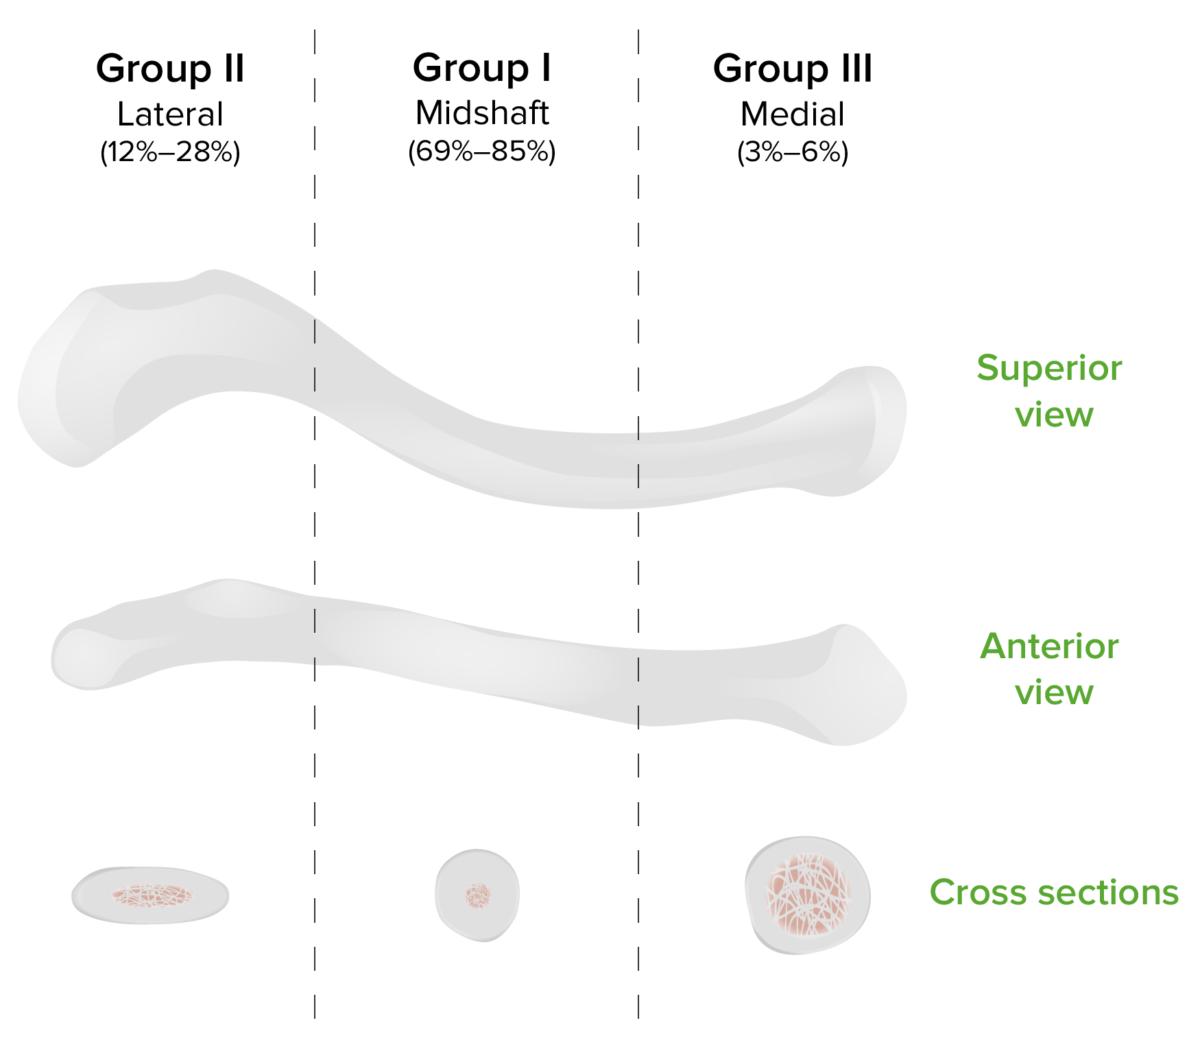 Allman classification